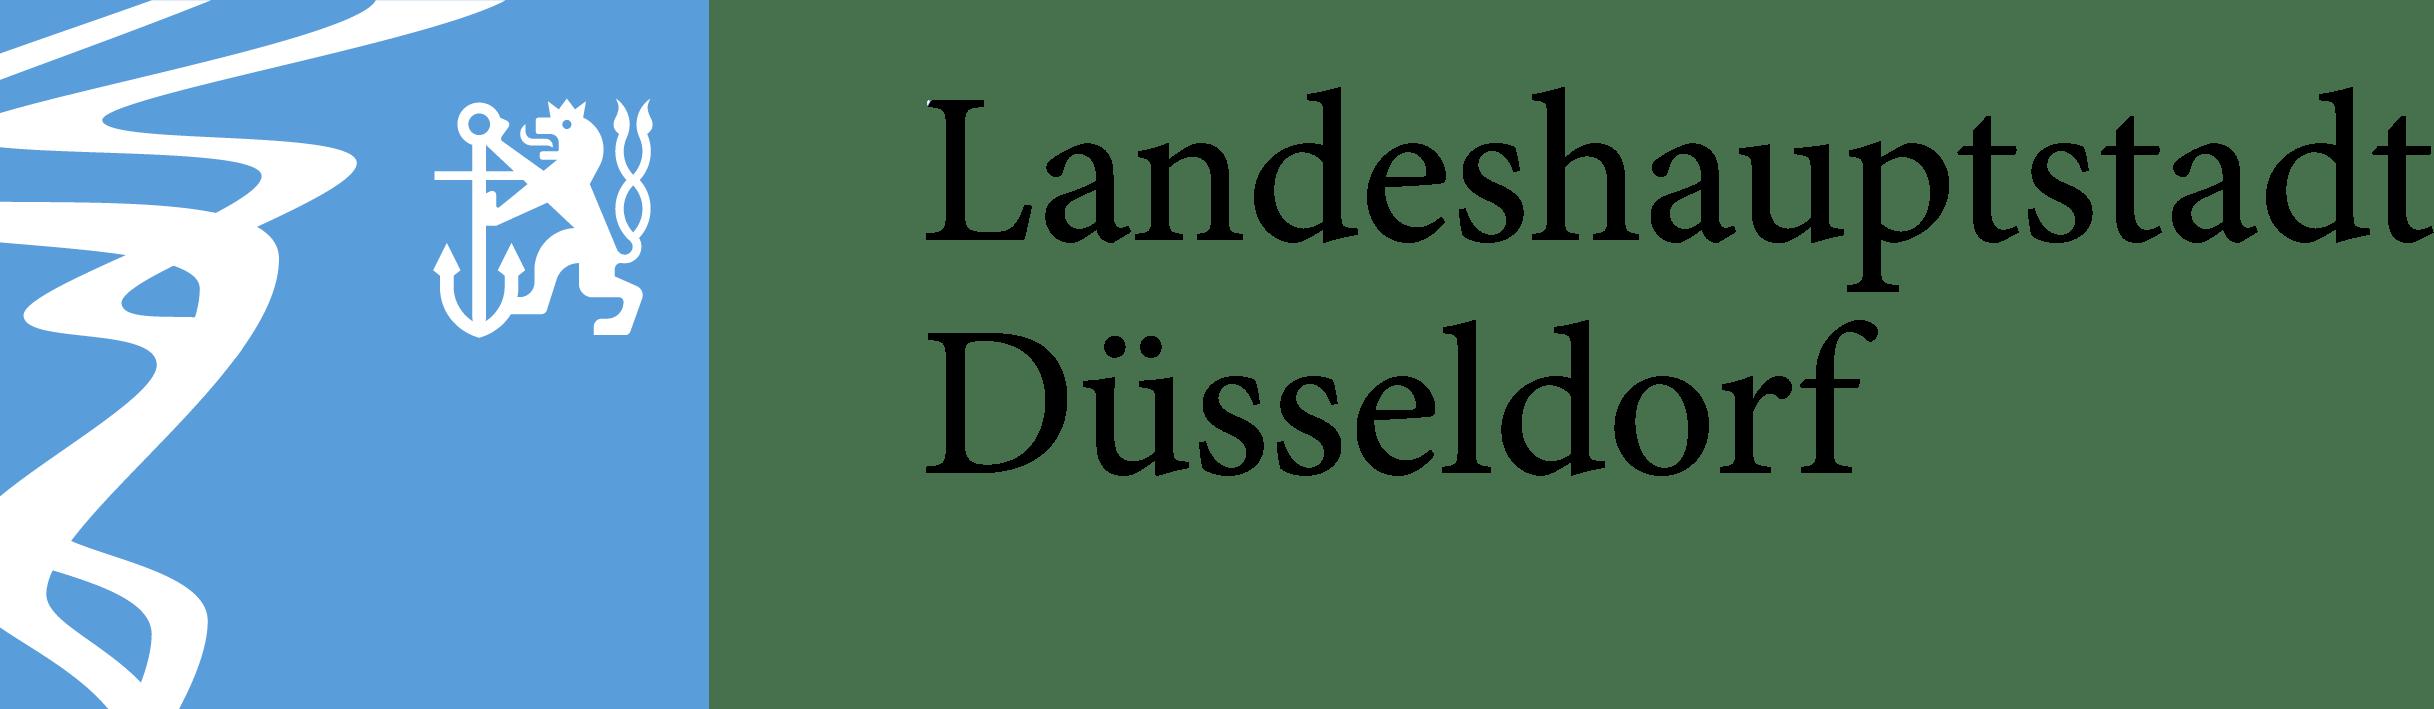 Landeshauptstadt_Düsseldorf